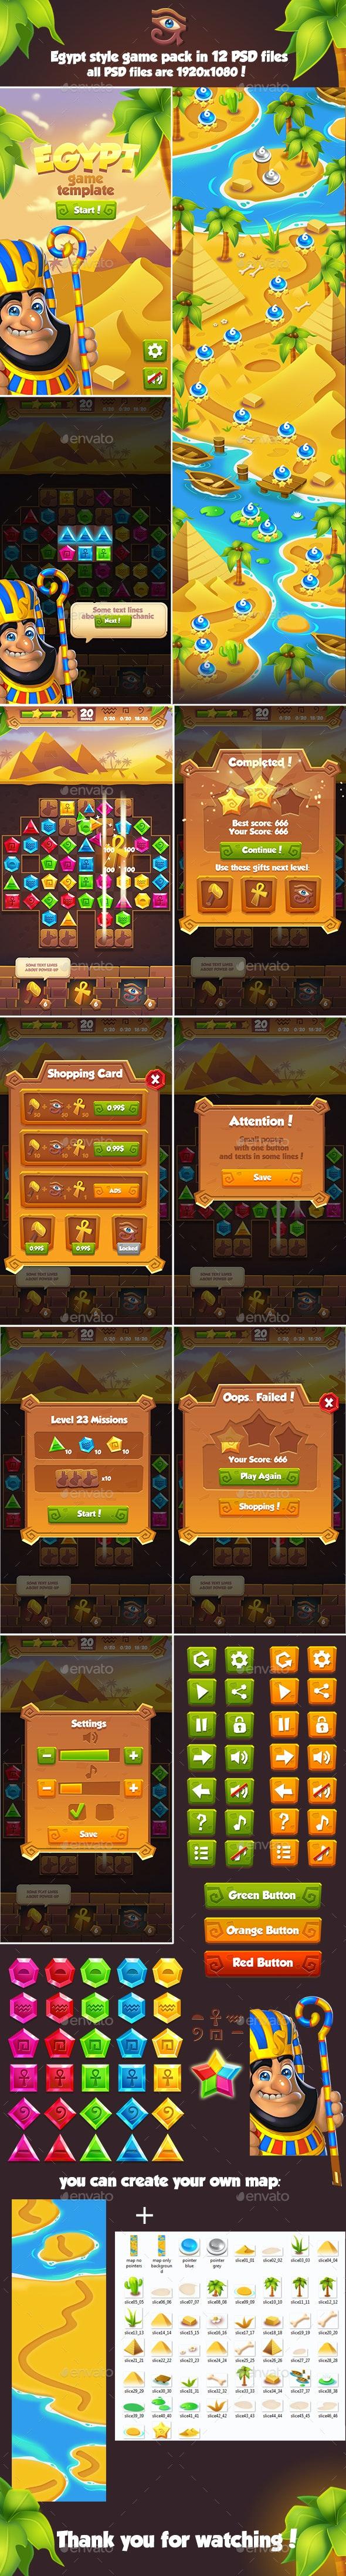 Full Egypt Game Pack - Game Kits Game Assets